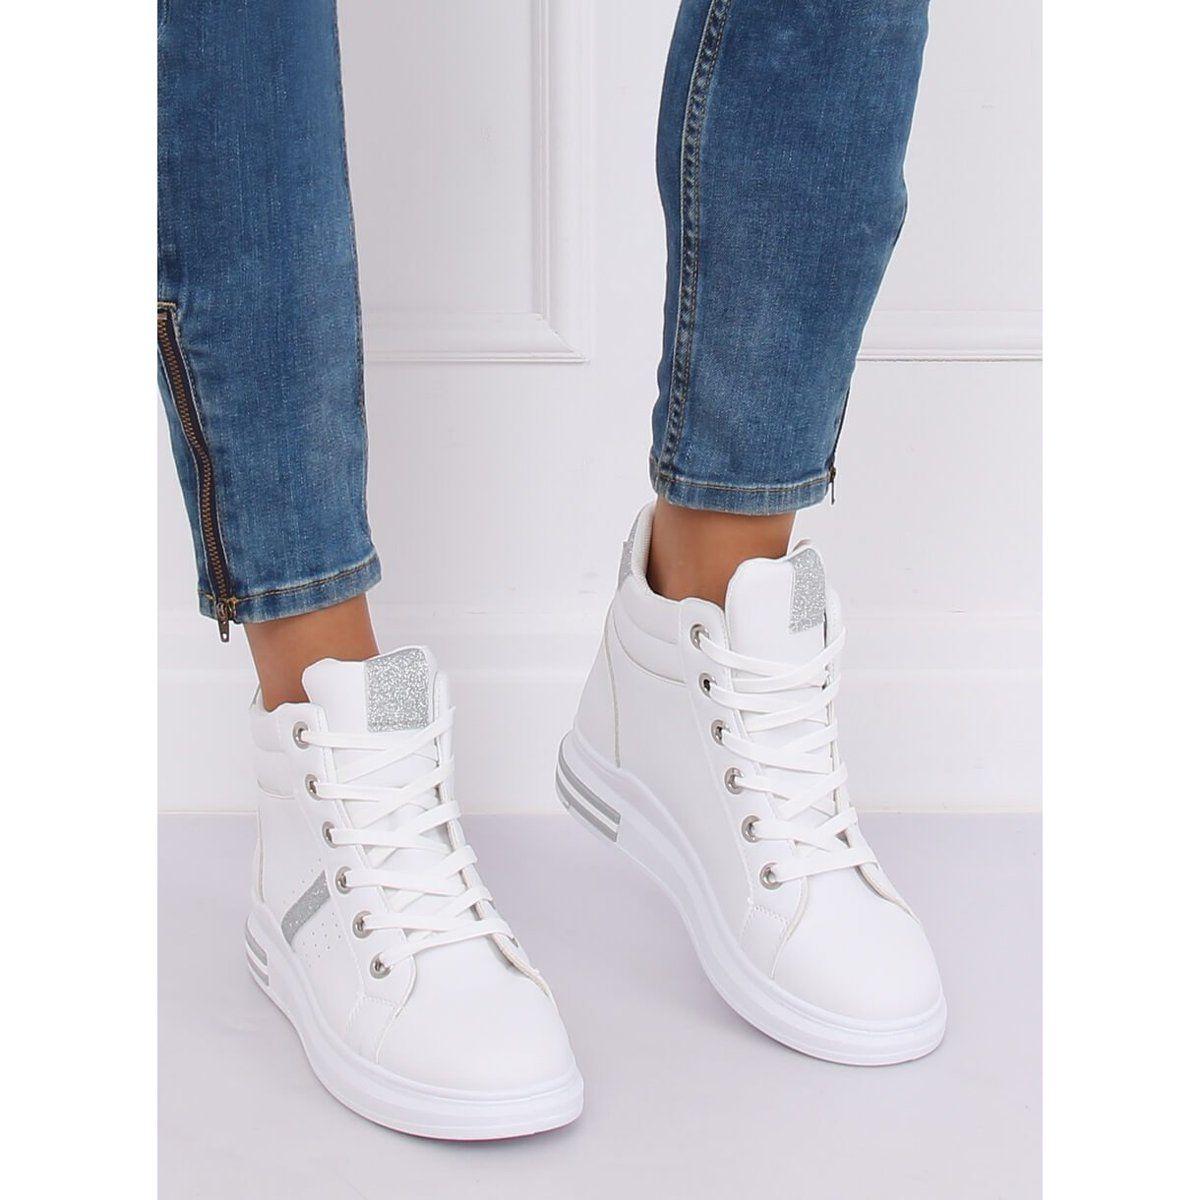 Trampki Za Kostke Biale Cb 19078 White Silver Sneakers High Top Sneakers Top Sneakers